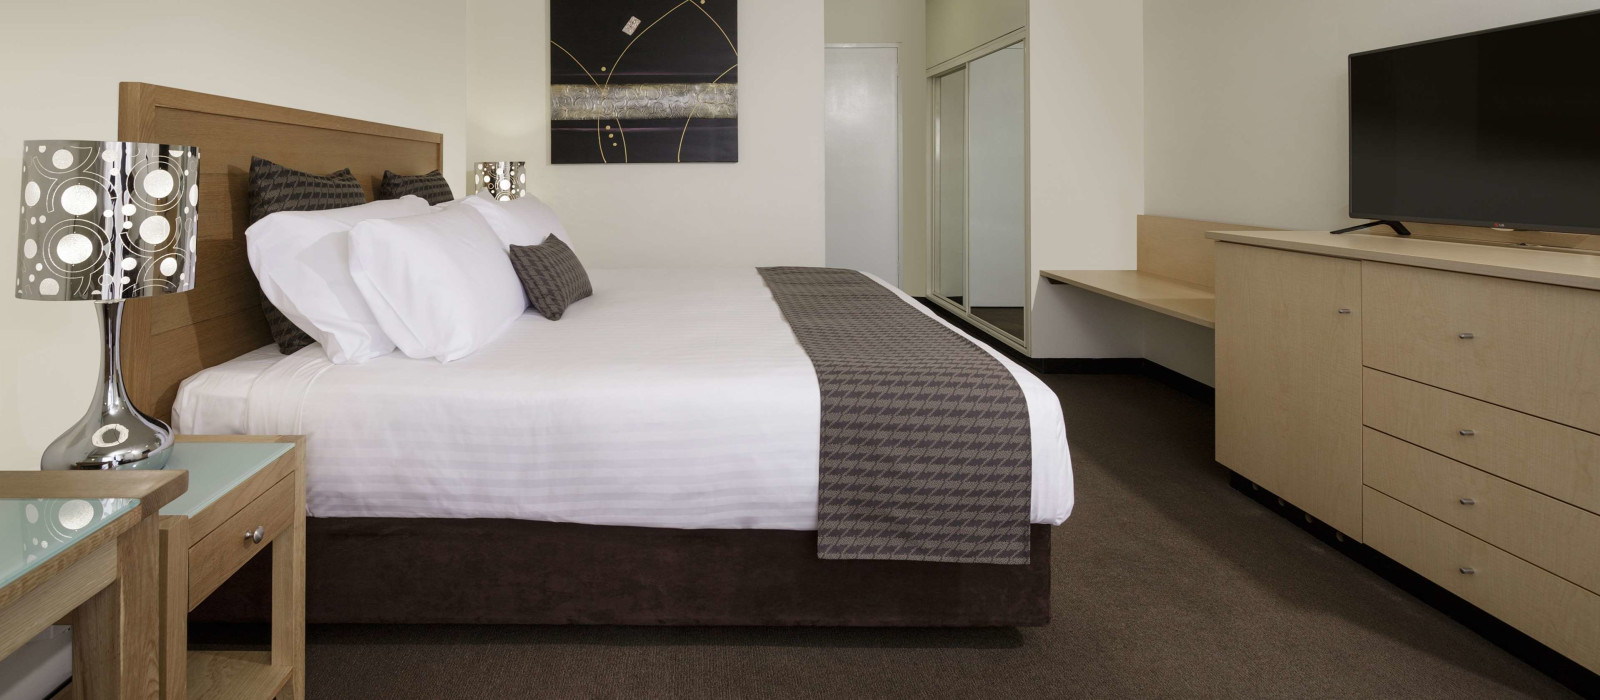 Hotel Best Western Hobart Australia